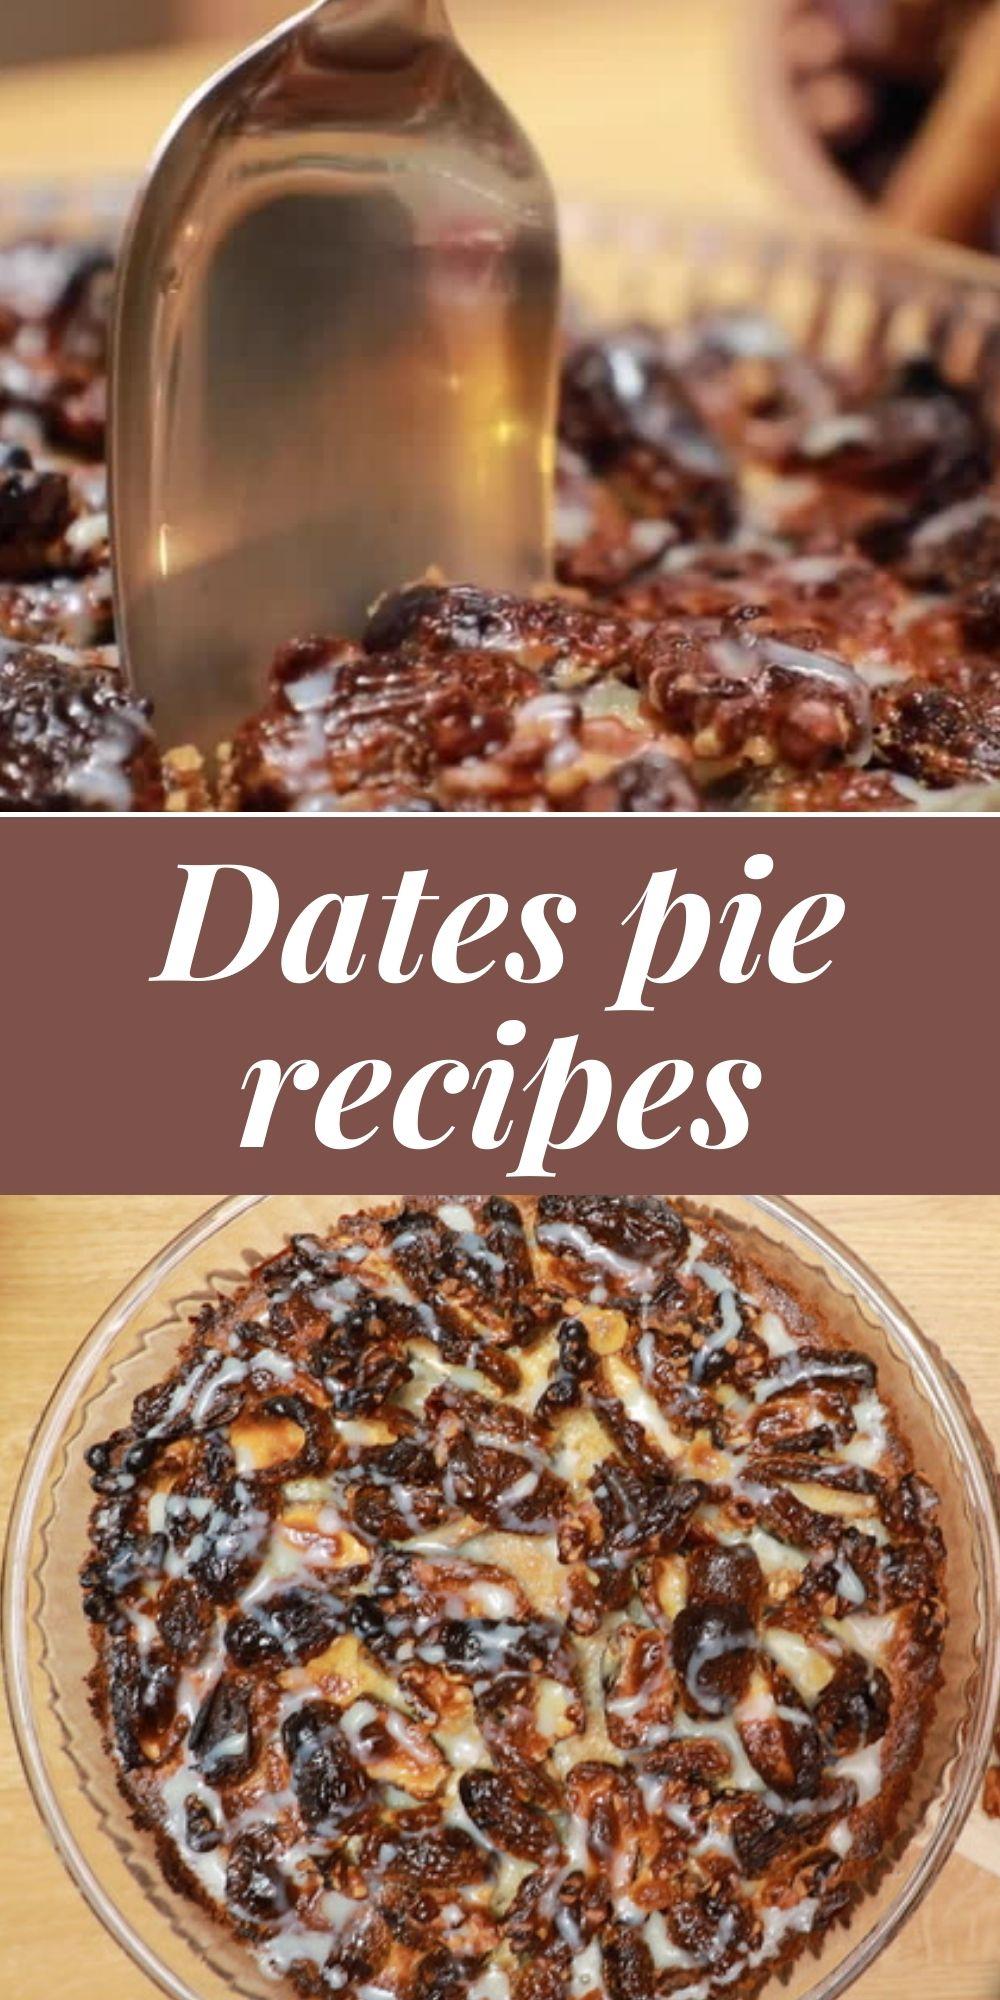 Dates pie